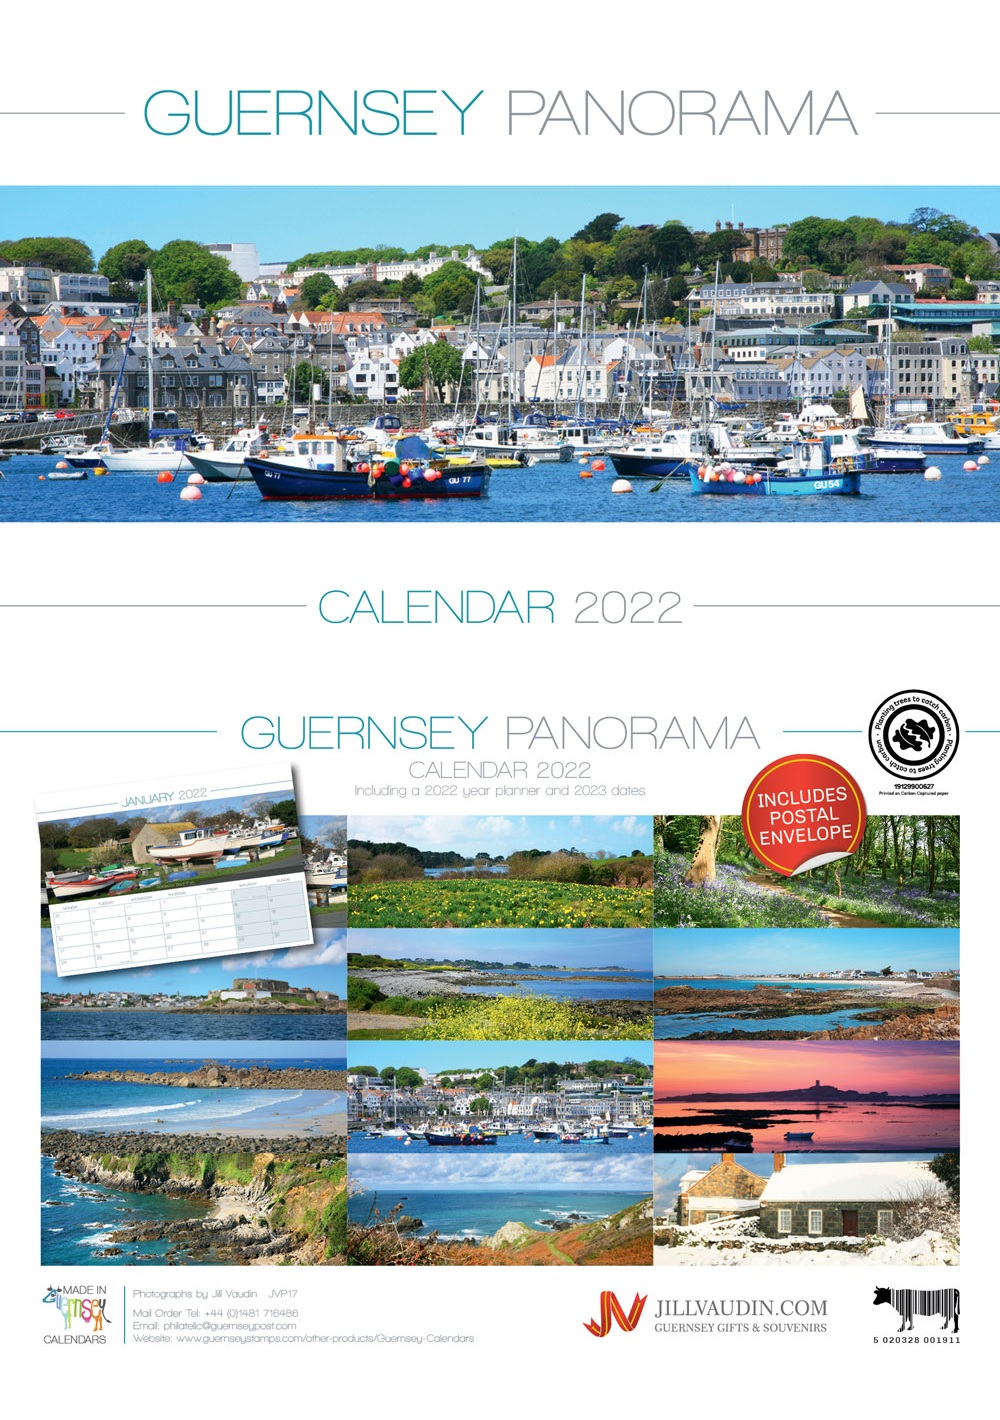 Guernsey Panorama Calendar 2022